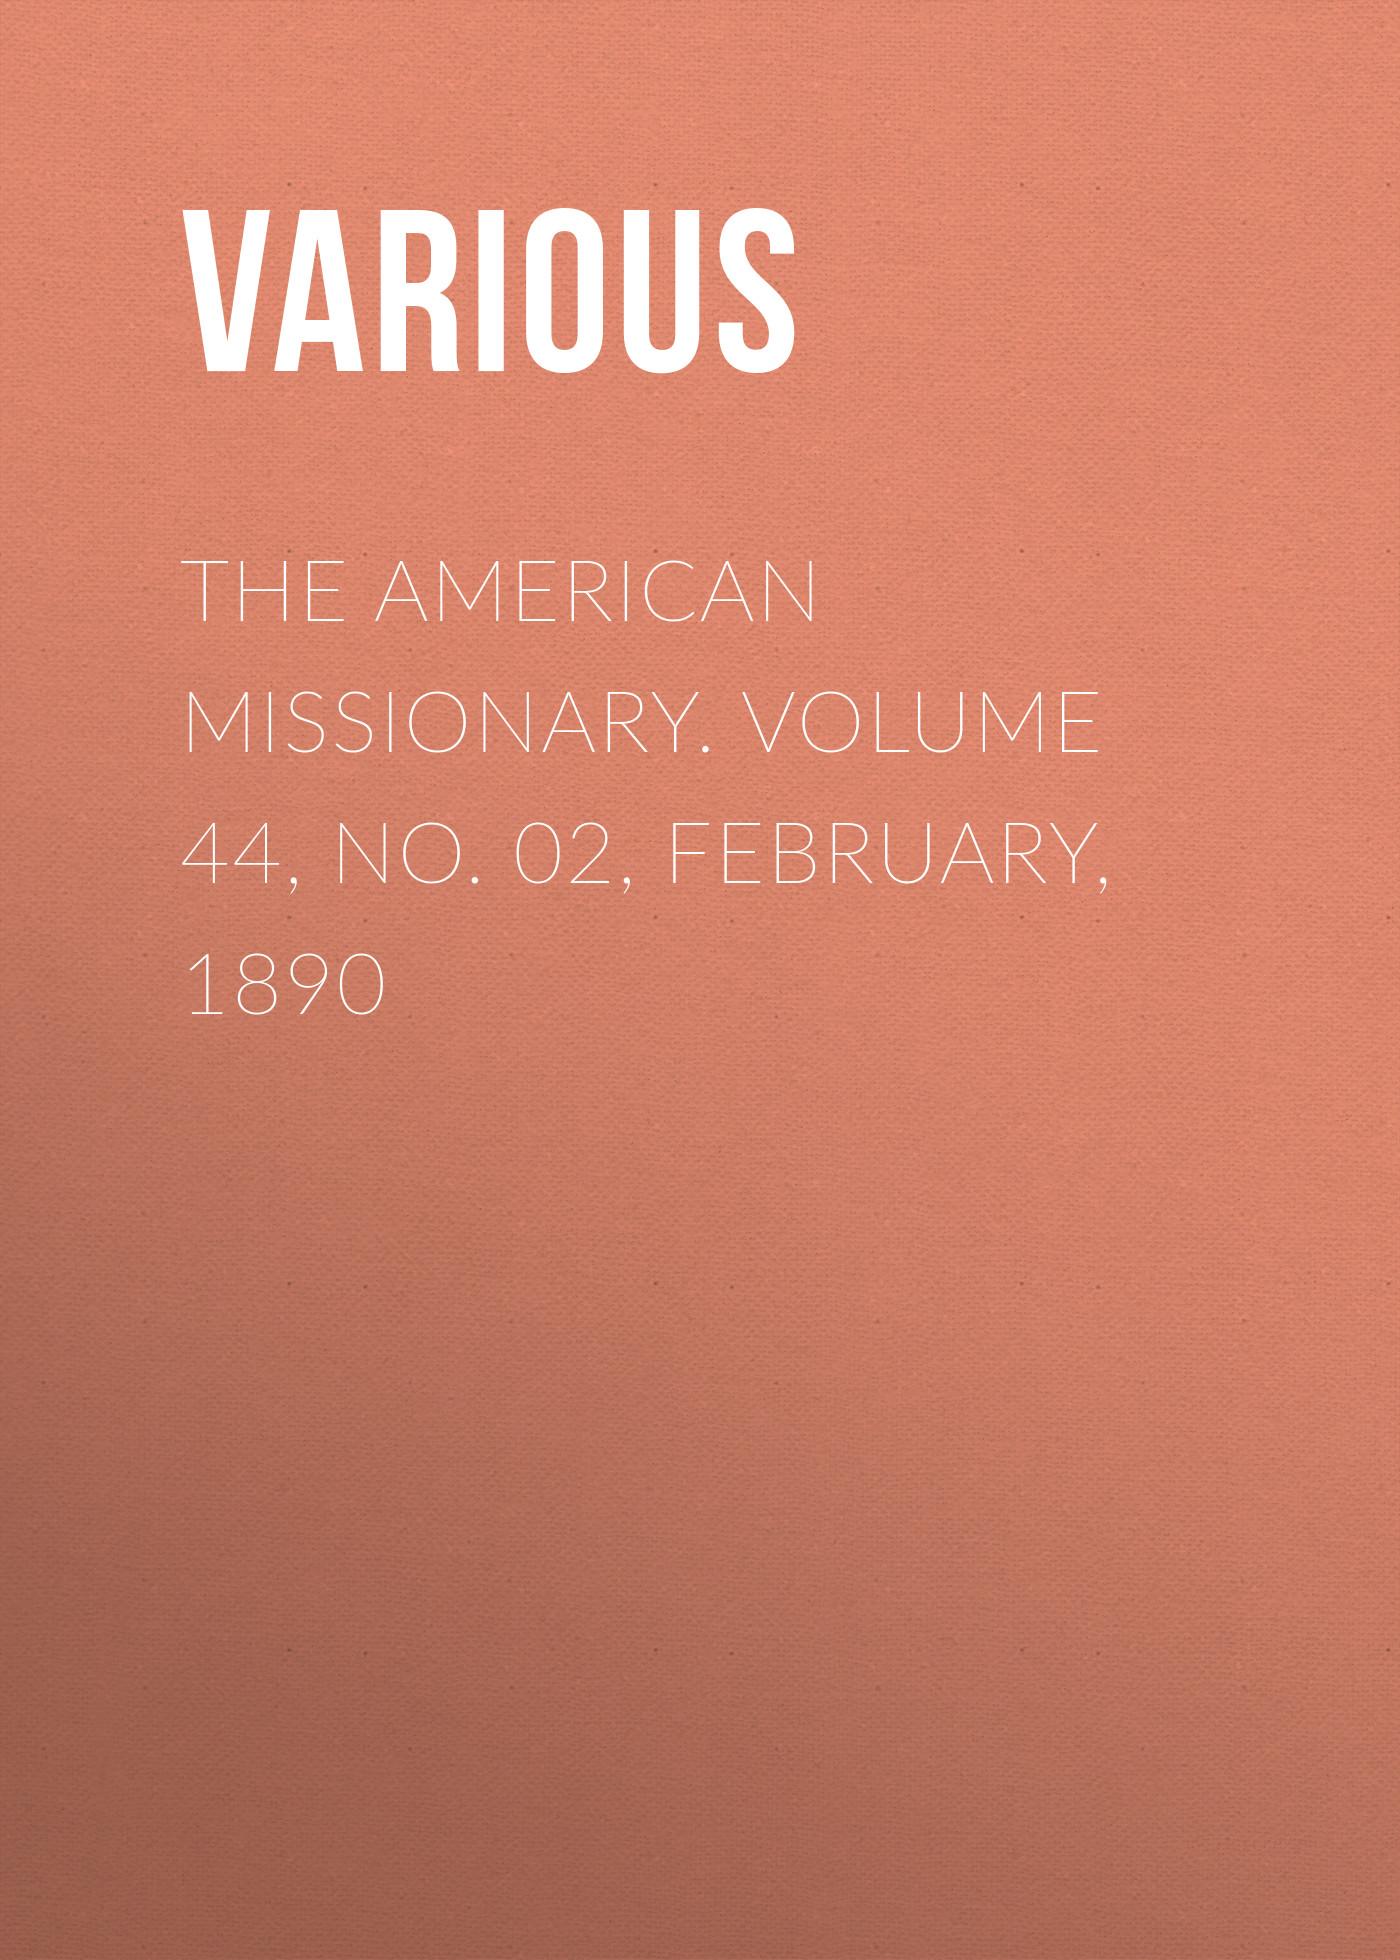 лучшая цена Various The American Missionary. Volume 44, No. 02, February, 1890